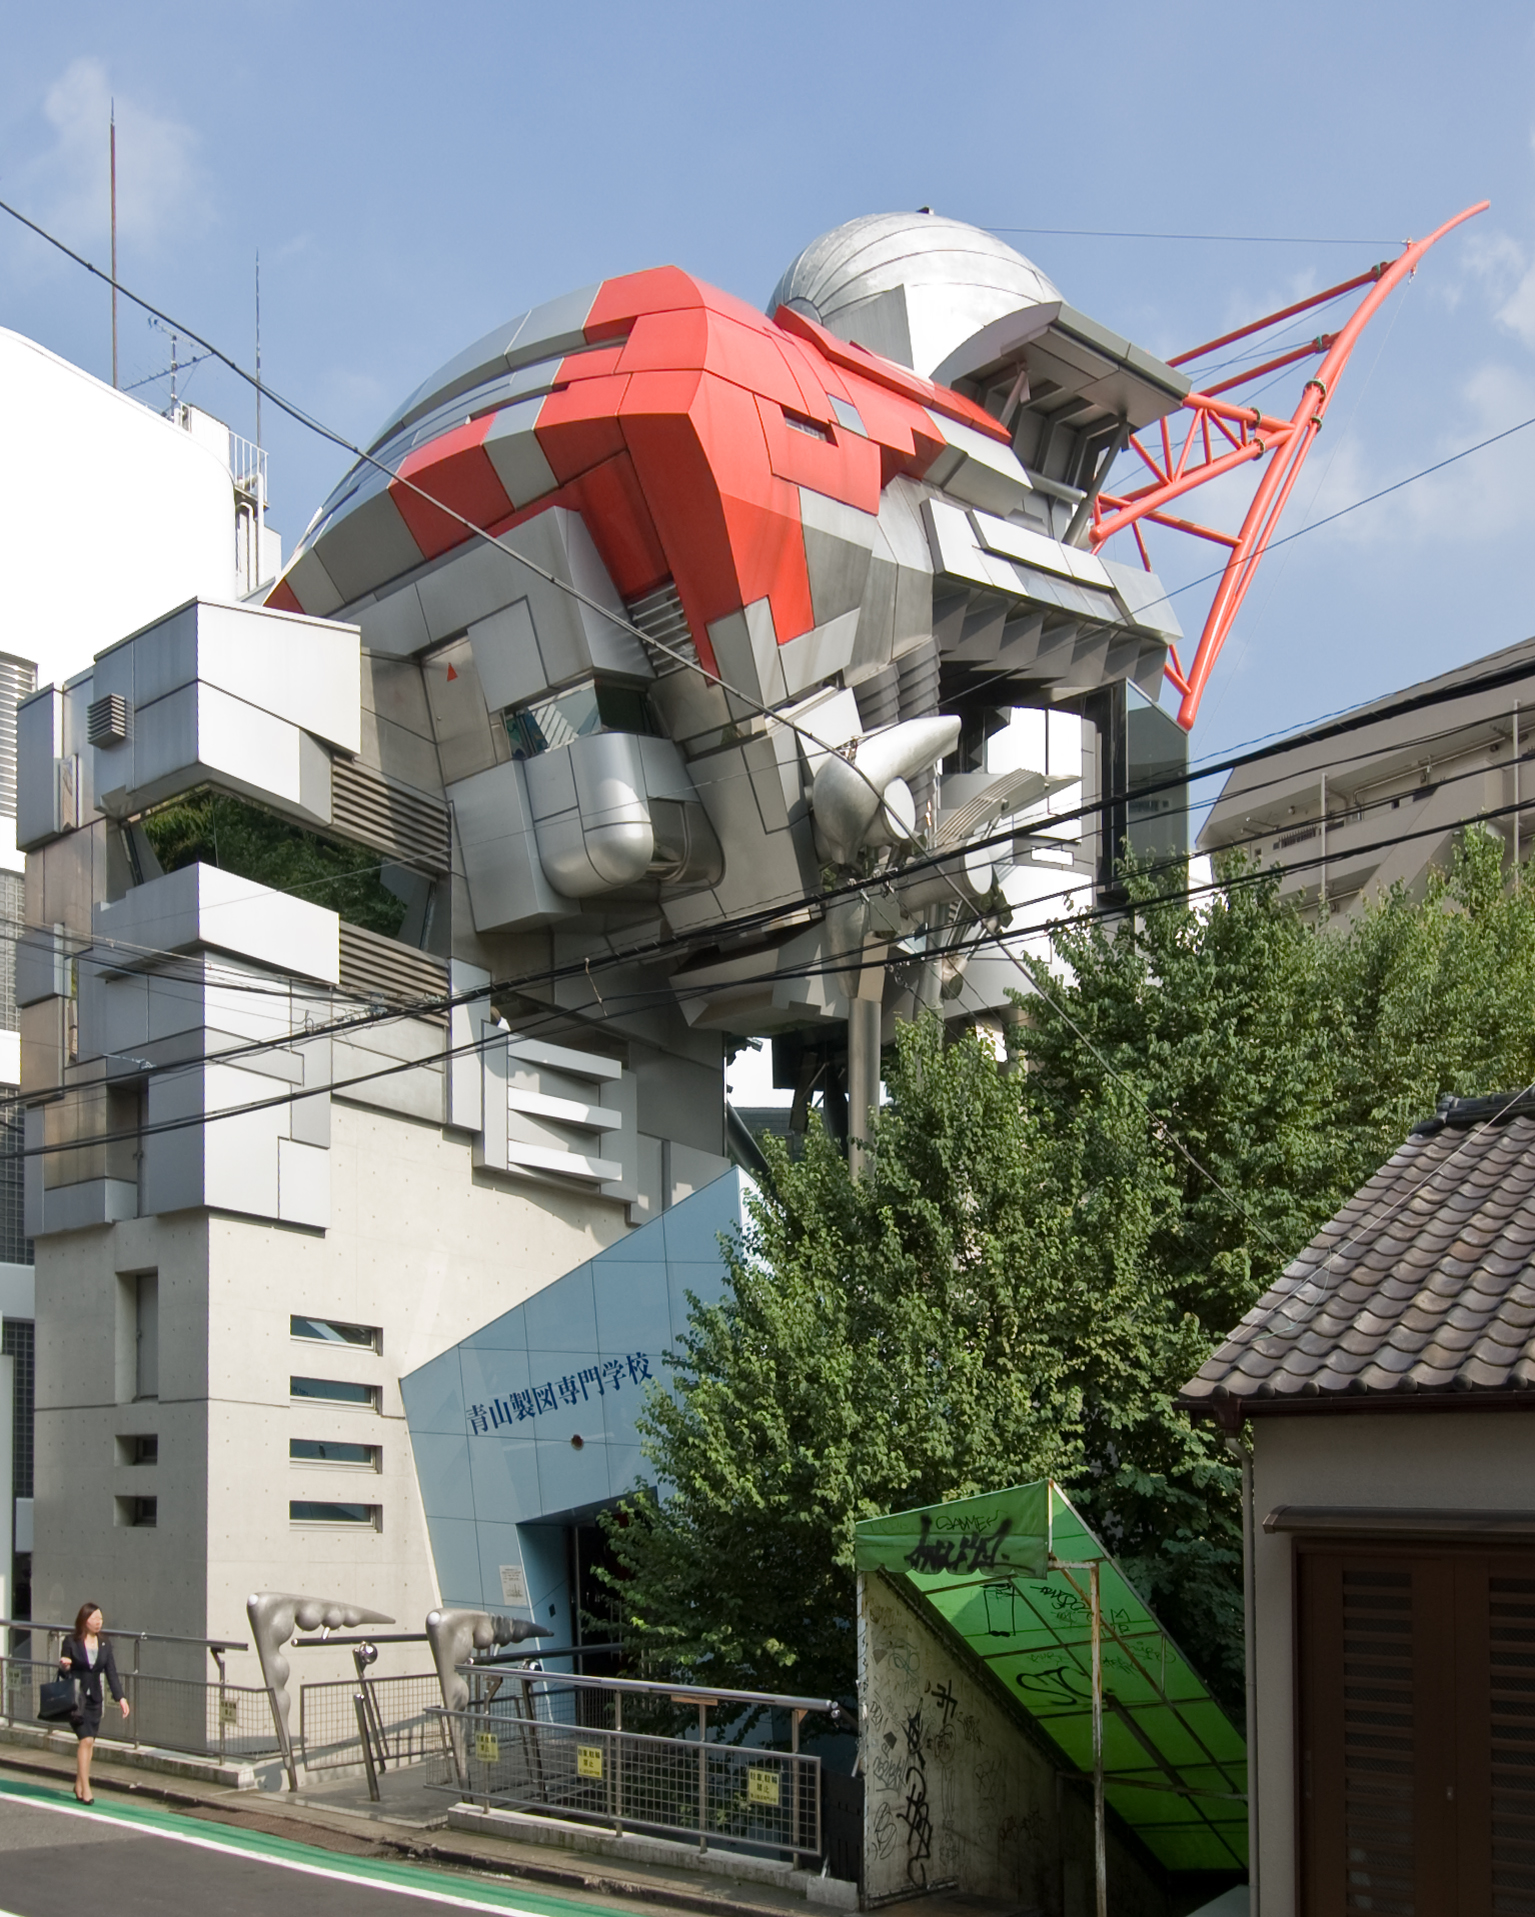 File:Aoyama Technical College.jpg - Wikimedia Commons